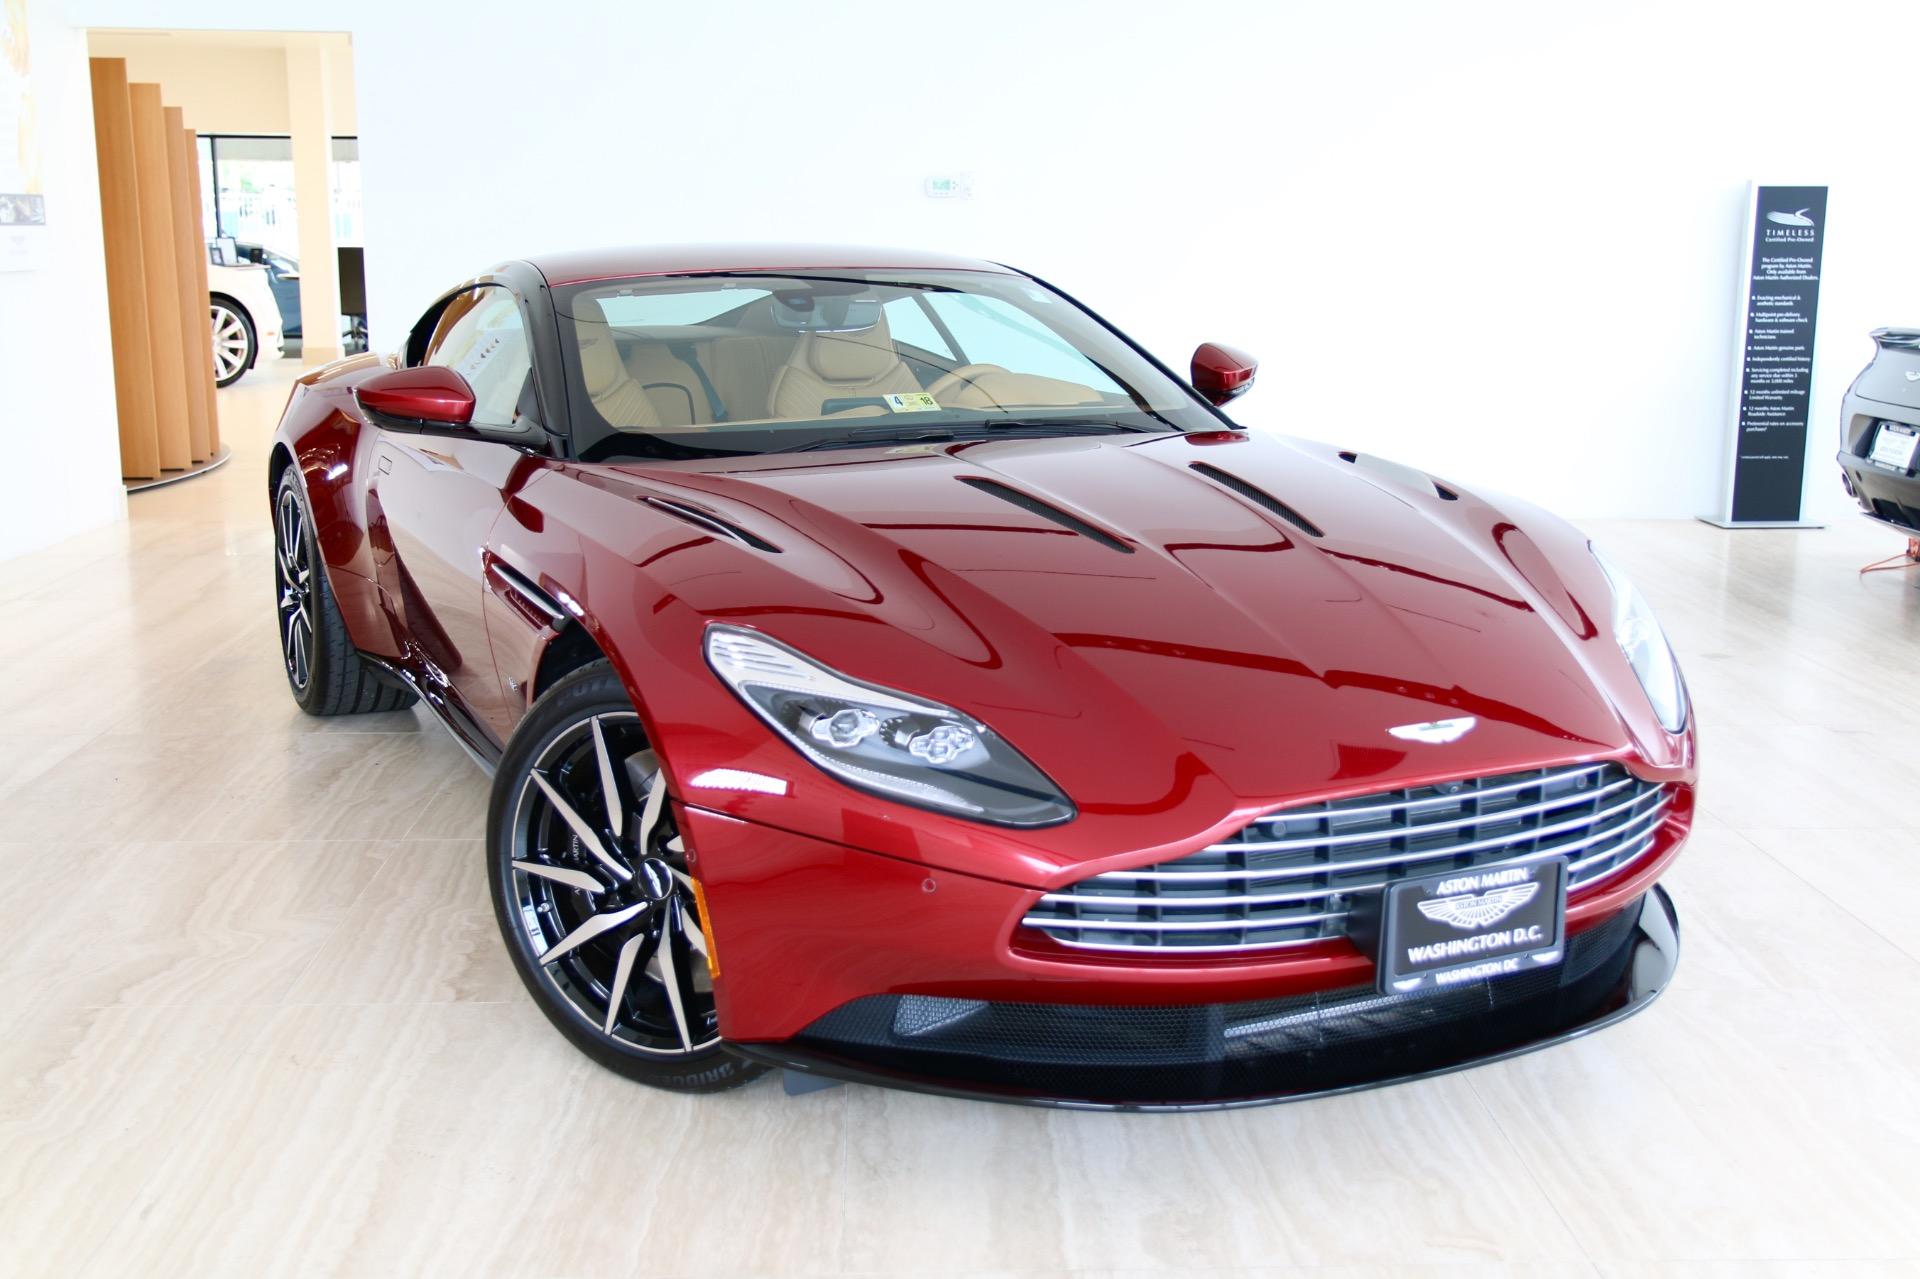 2017 Aston Martin Db11 Stock 7nl01826 For Sale Near Vienna Va